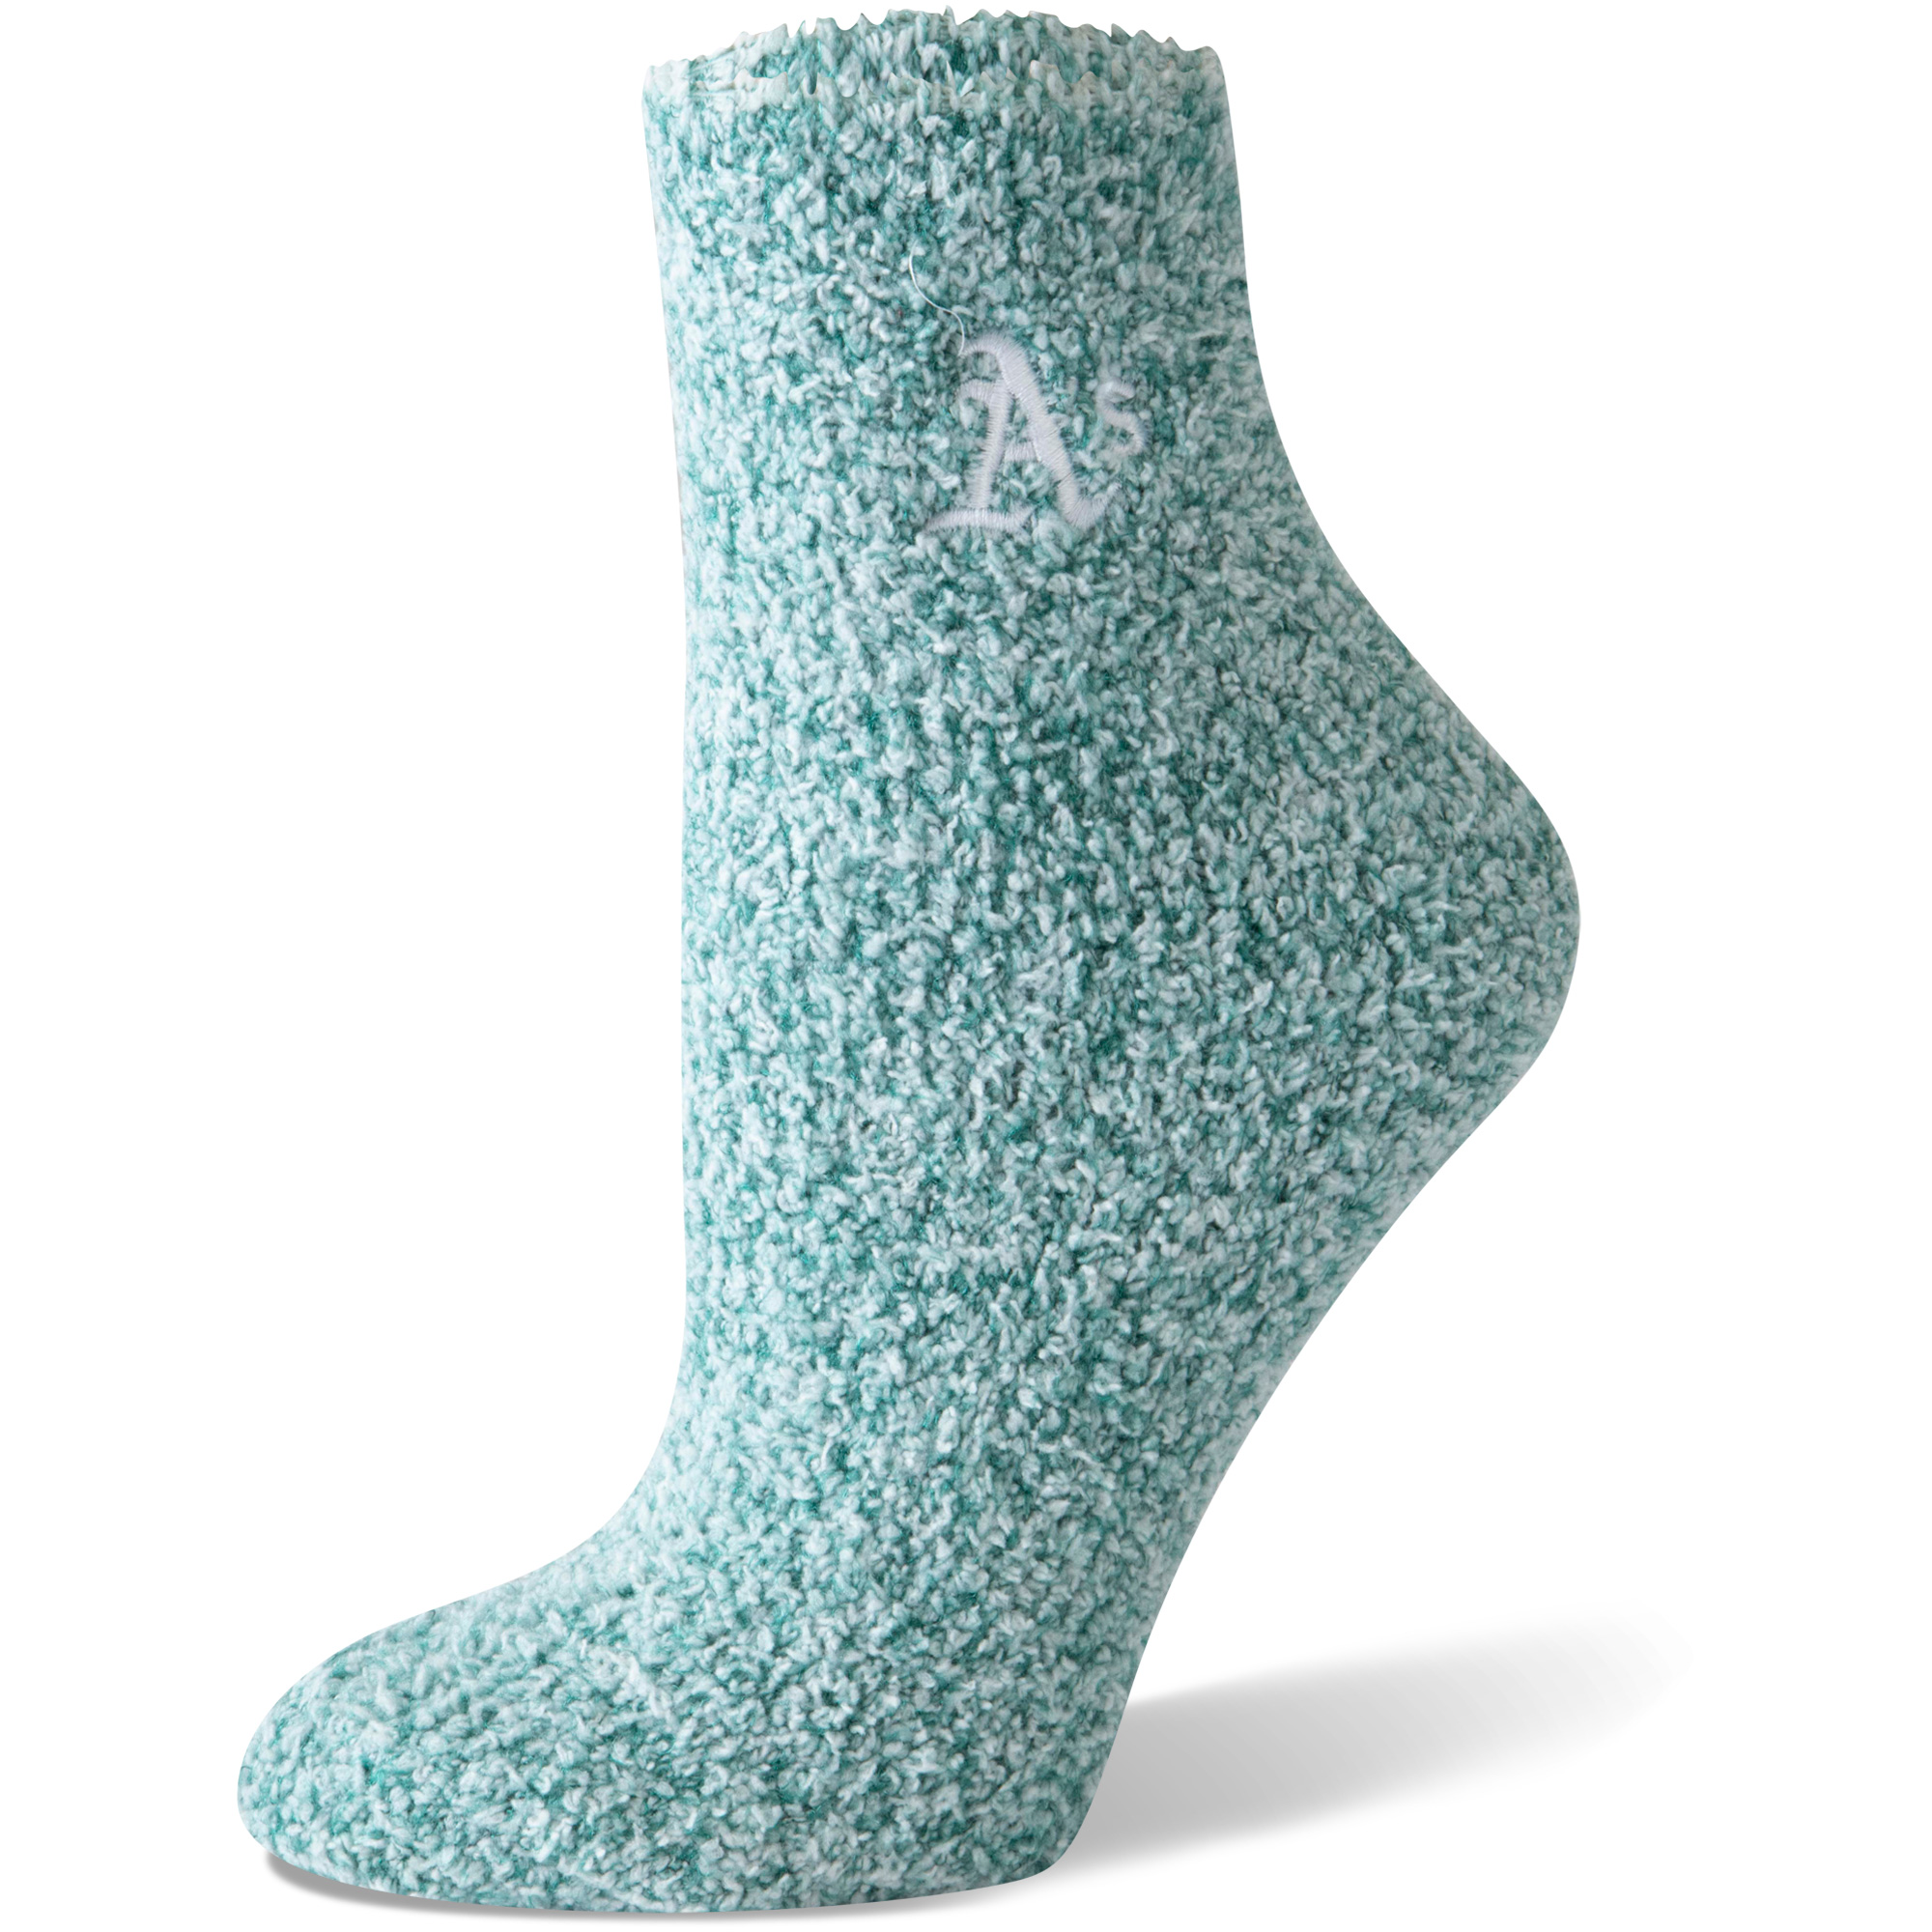 Oakland Athletics Women's Fuzzy Block Tri-Blend Socks - Green - M